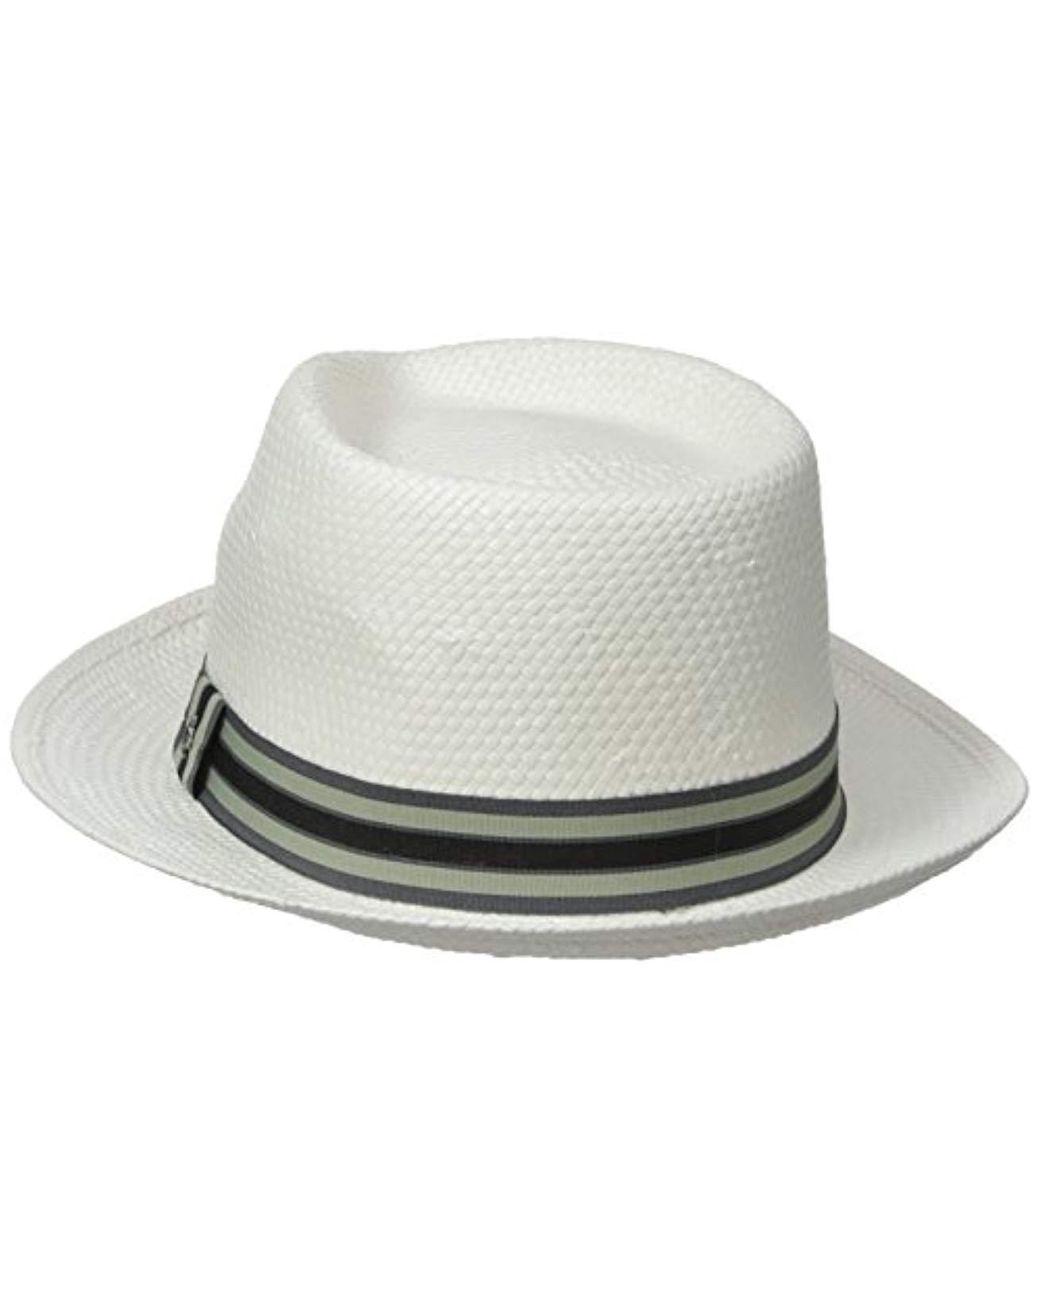 COLLJL-8 Men//Women Columbus Day 1942 Outdoor Fashion Knit Beanies Hat Soft Winter Knit Caps